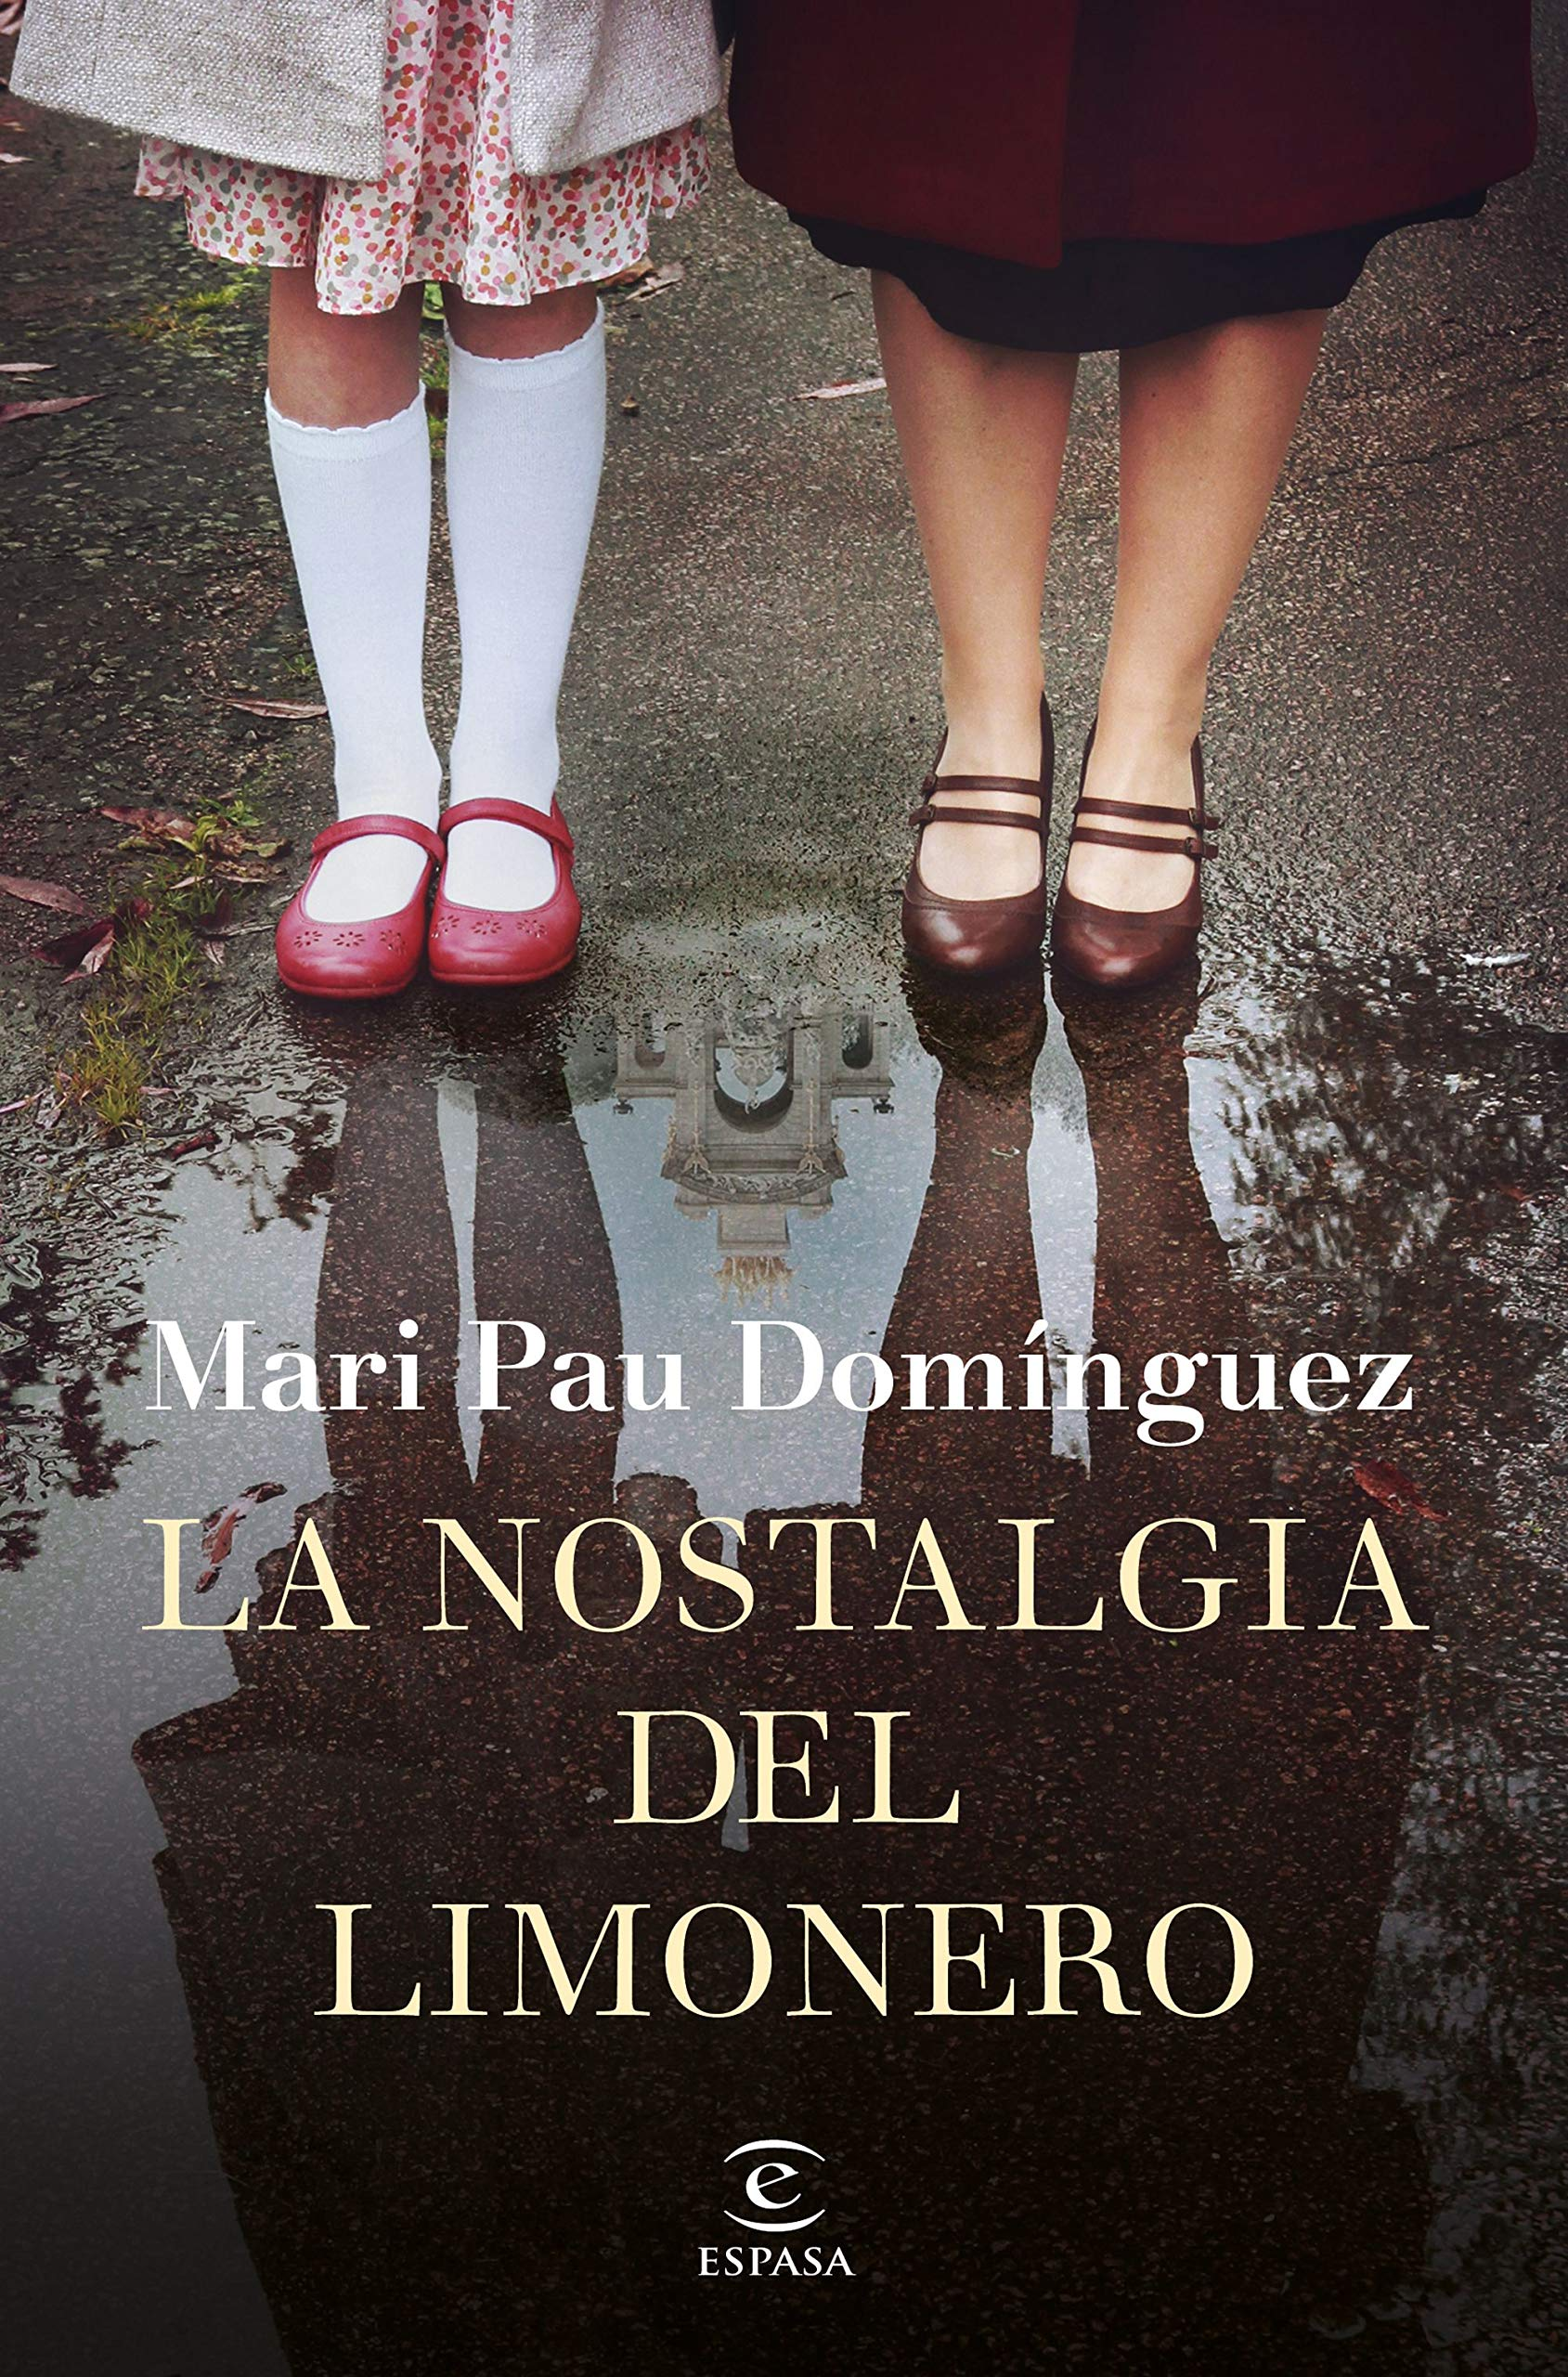 La nostalgia del limonero (ESPASA NARRATIVA): Amazon.es: Domínguez, Mari Pau: Libros